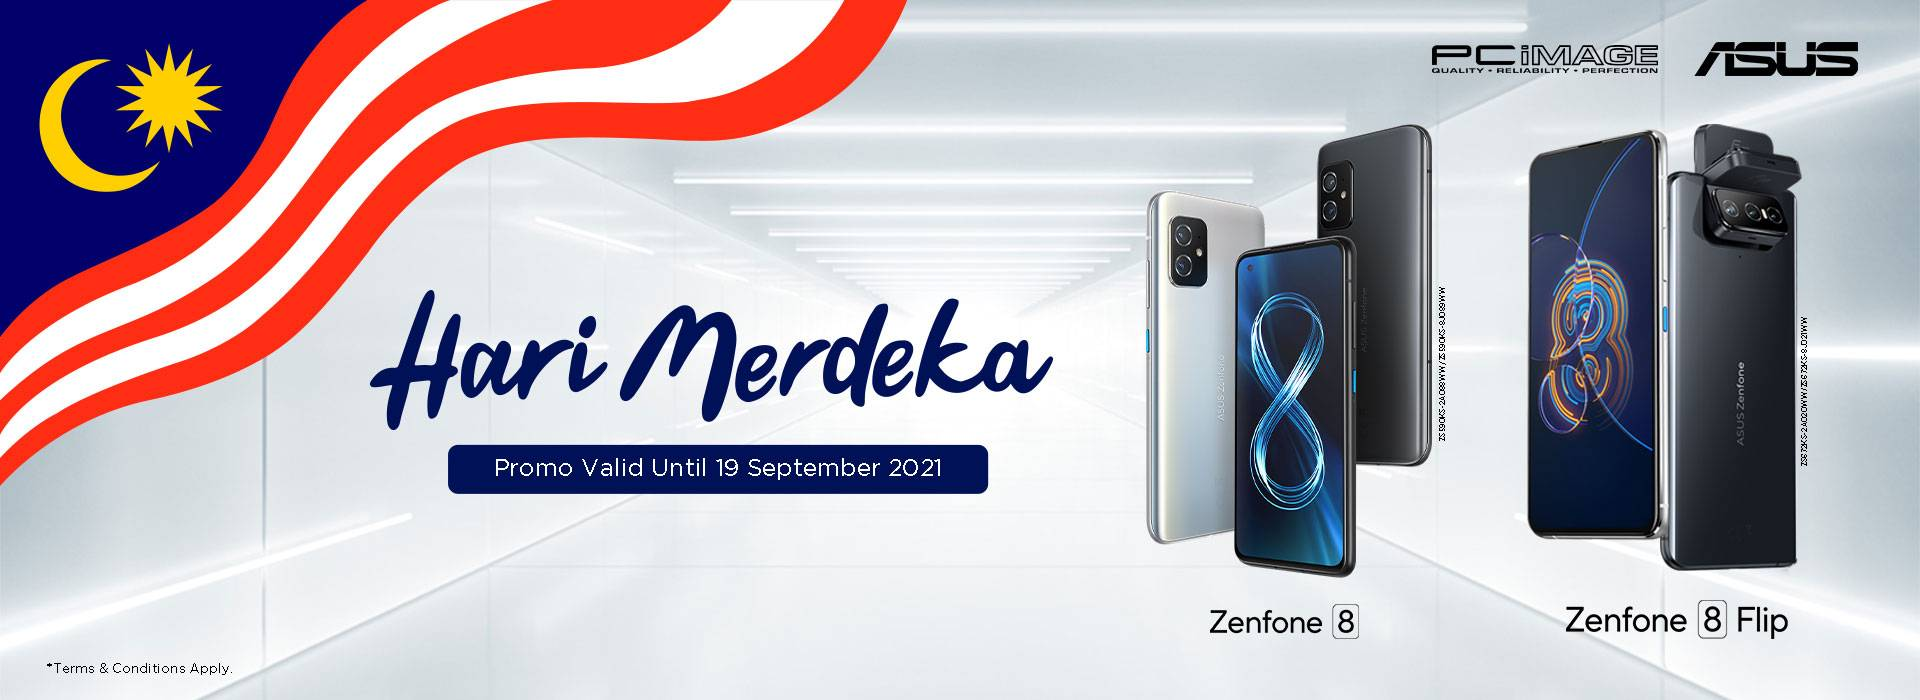 Asus Zenfone 8 Merdeka Promo 30 Sept